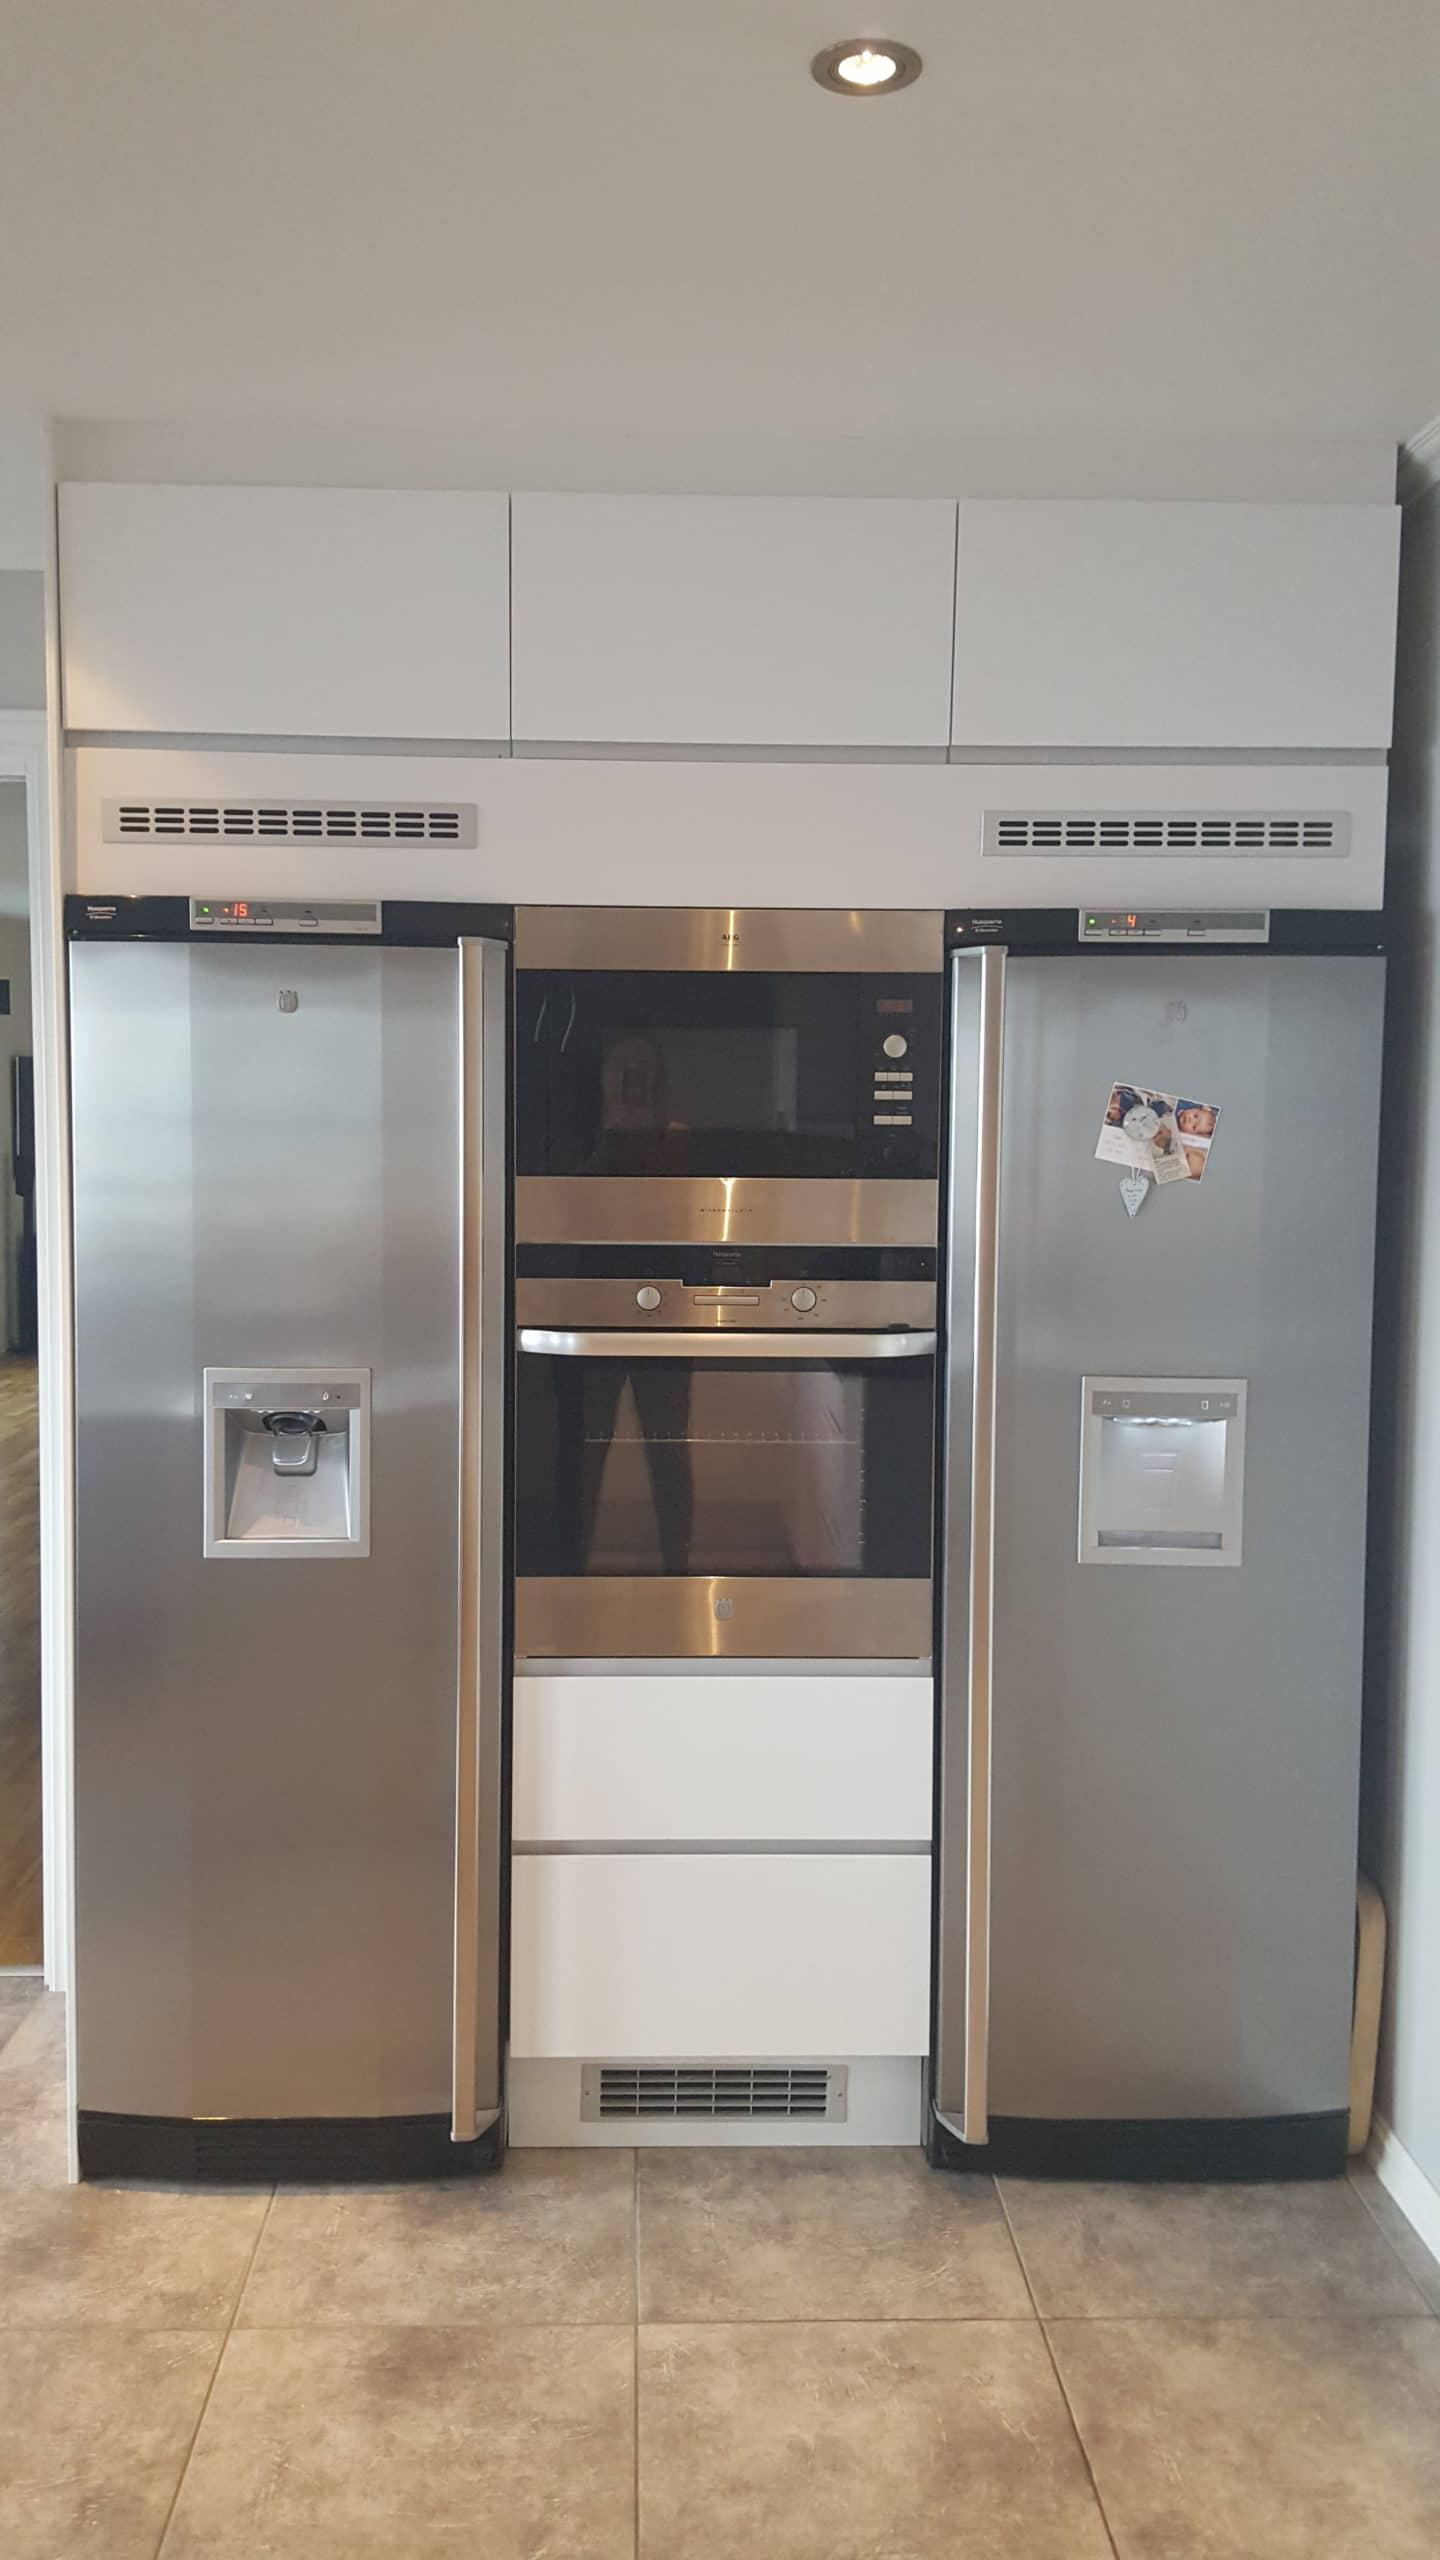 Fridge and refrigerator